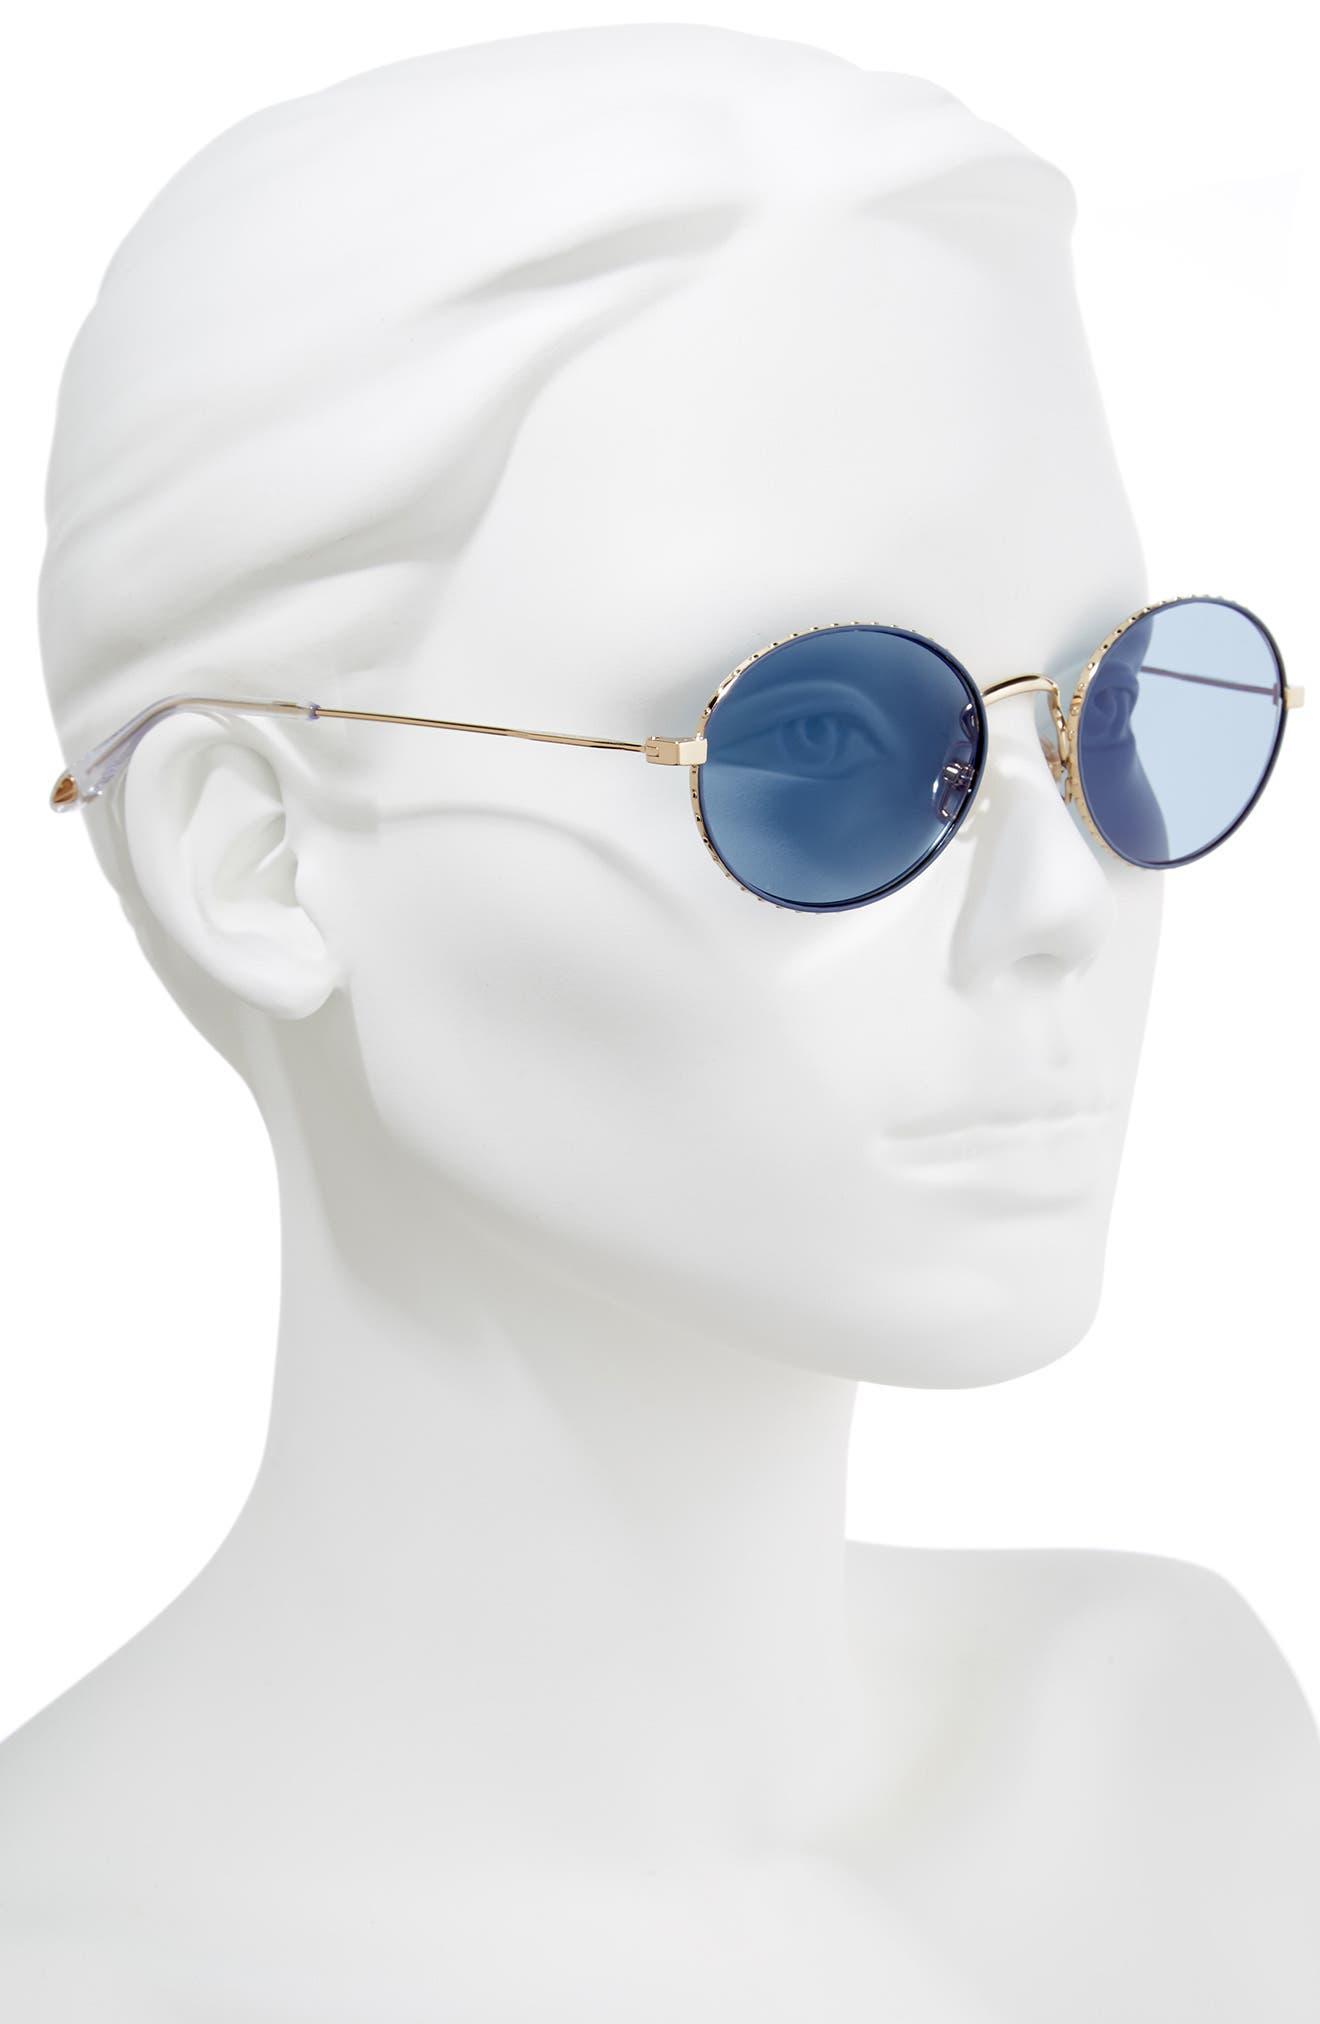 53mm Oval Sunglasses,                             Alternate thumbnail 2, color,                             GOLD/ BLUE